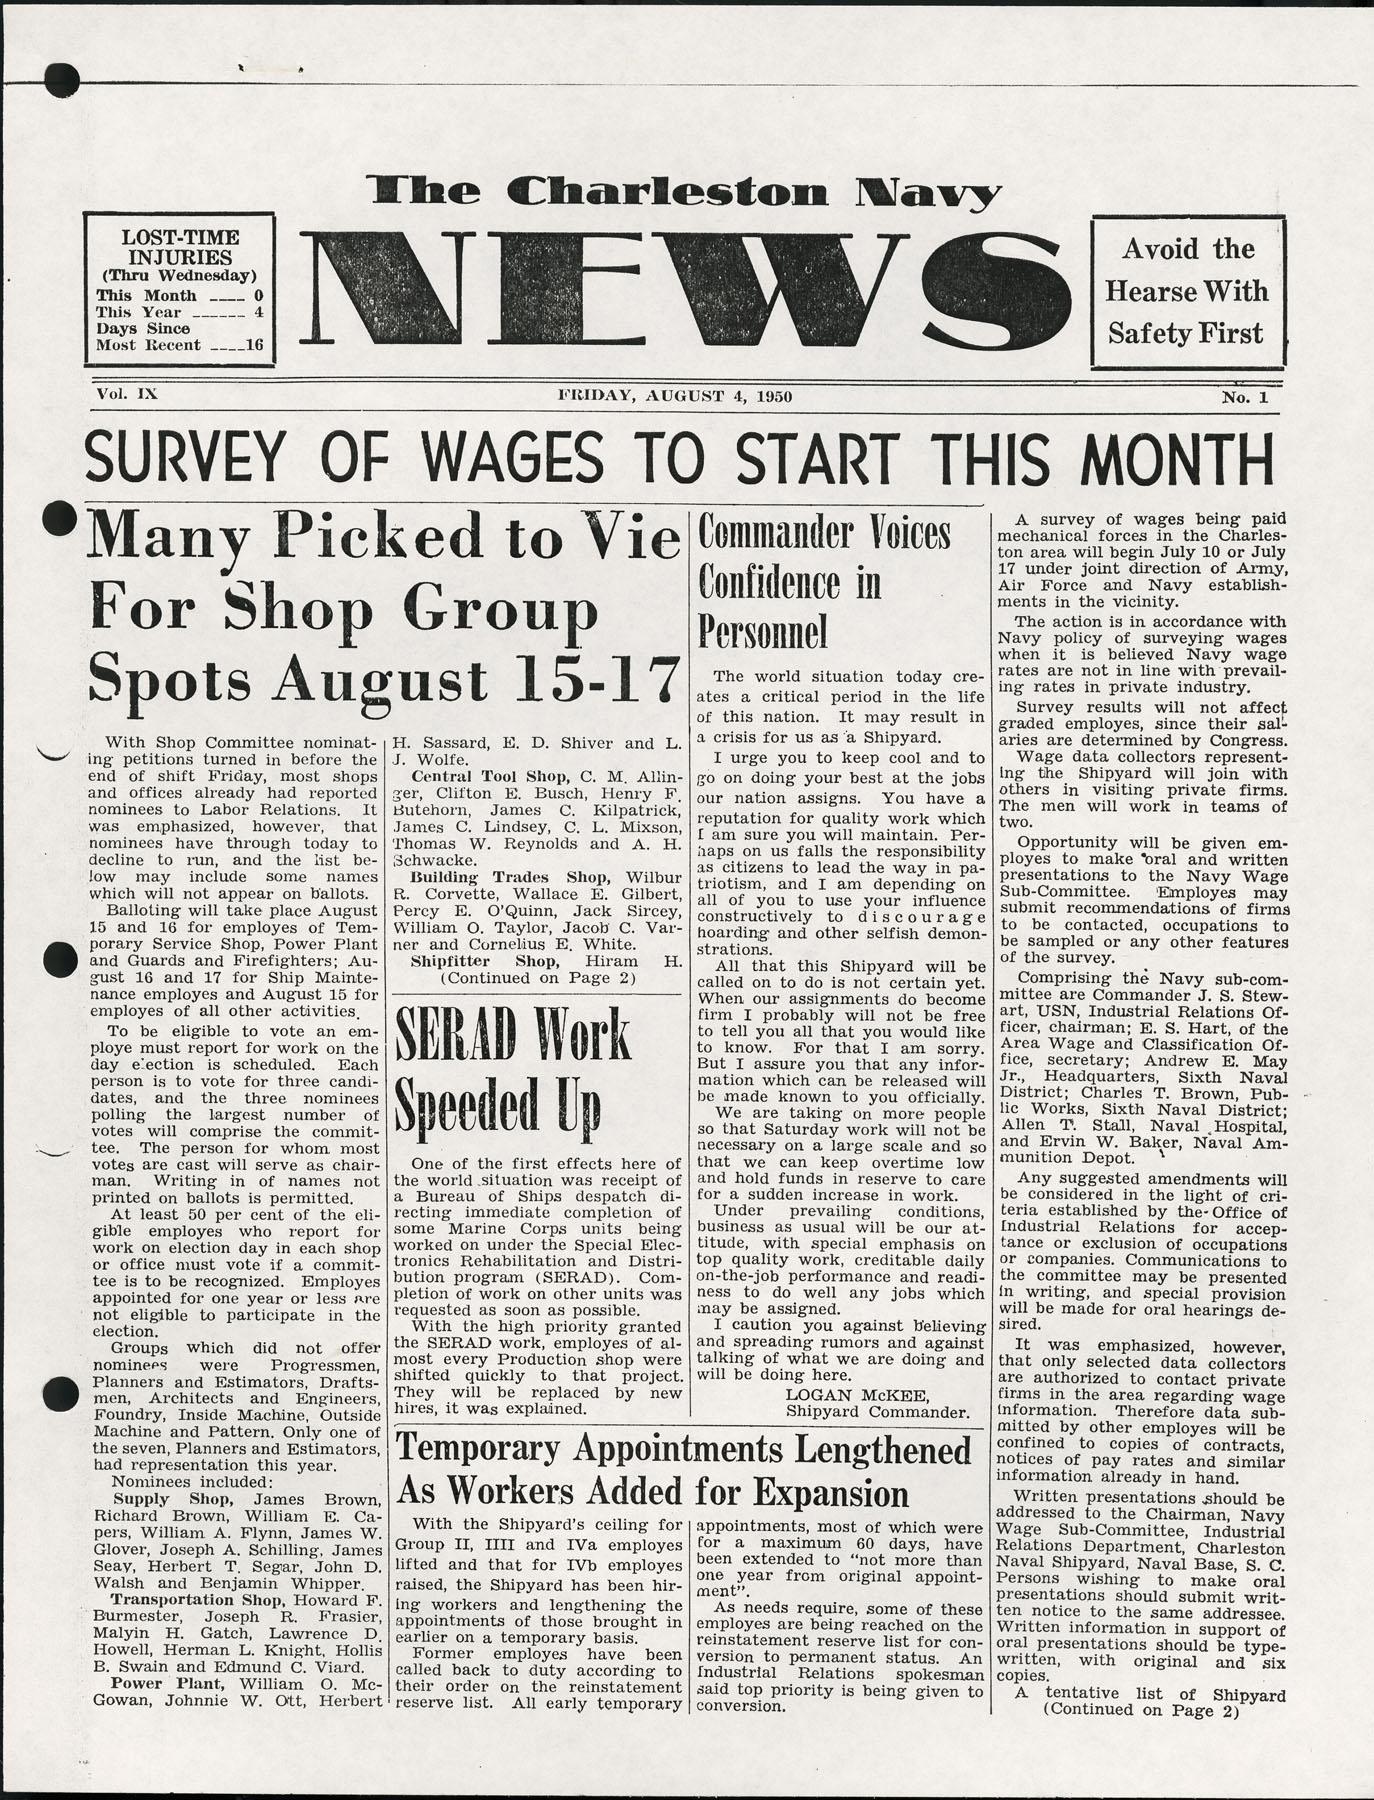 The Charleston Navy News, Volume 9, Edition 1, page i